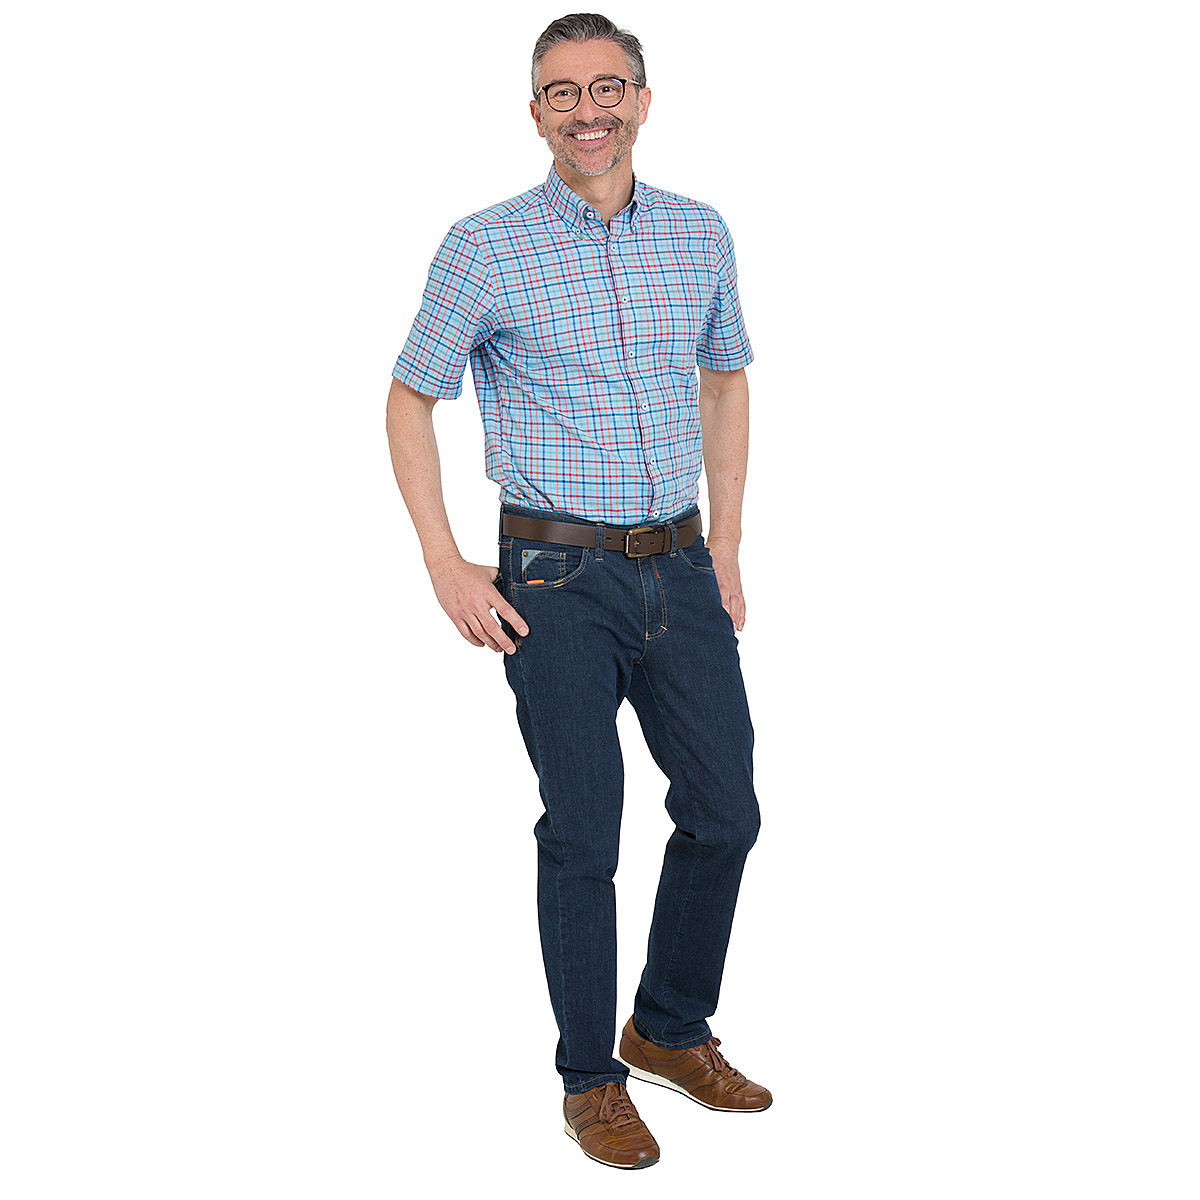 club of comfort high stretch denim jeans farbe blue gr enspezialist m nnermode. Black Bedroom Furniture Sets. Home Design Ideas